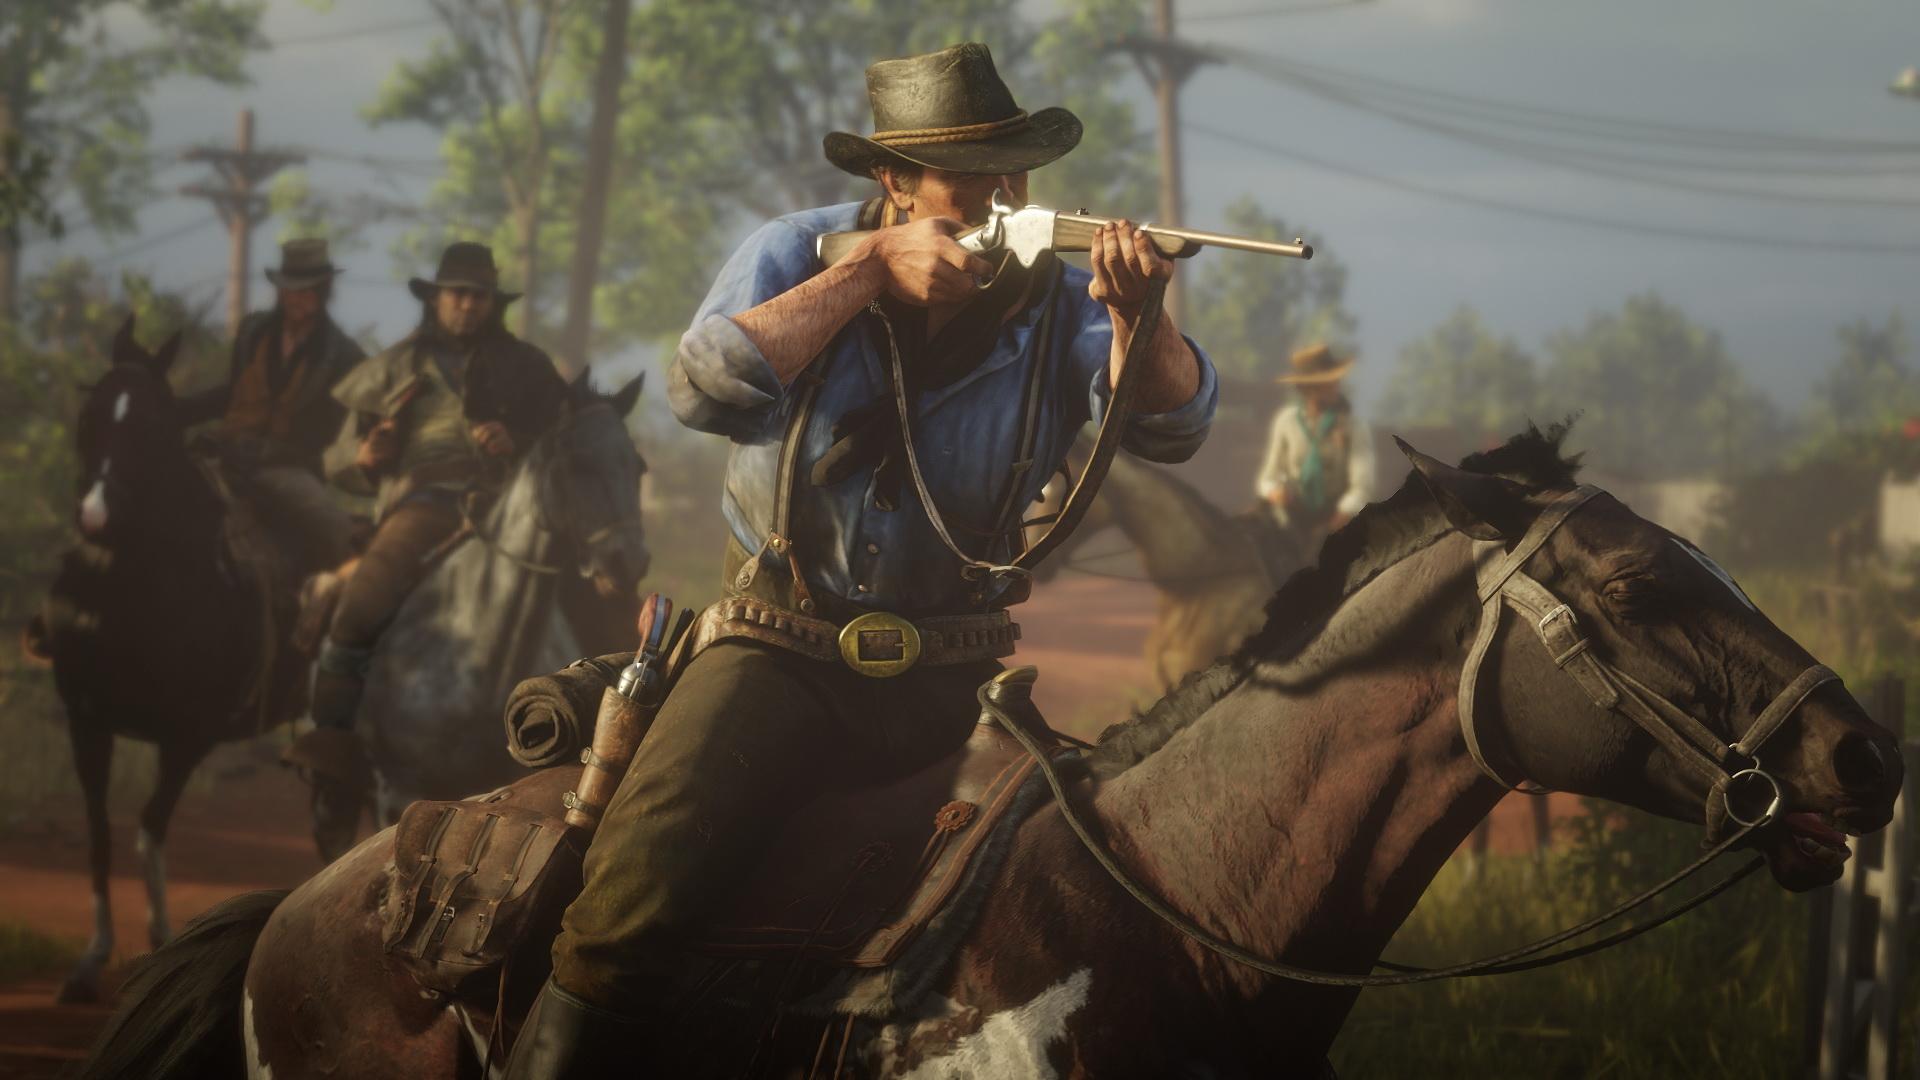 Red Dead Redemption 2 İncelemesi | Red Dead Redemption 2 Atla Giderken Silah Kullanmak